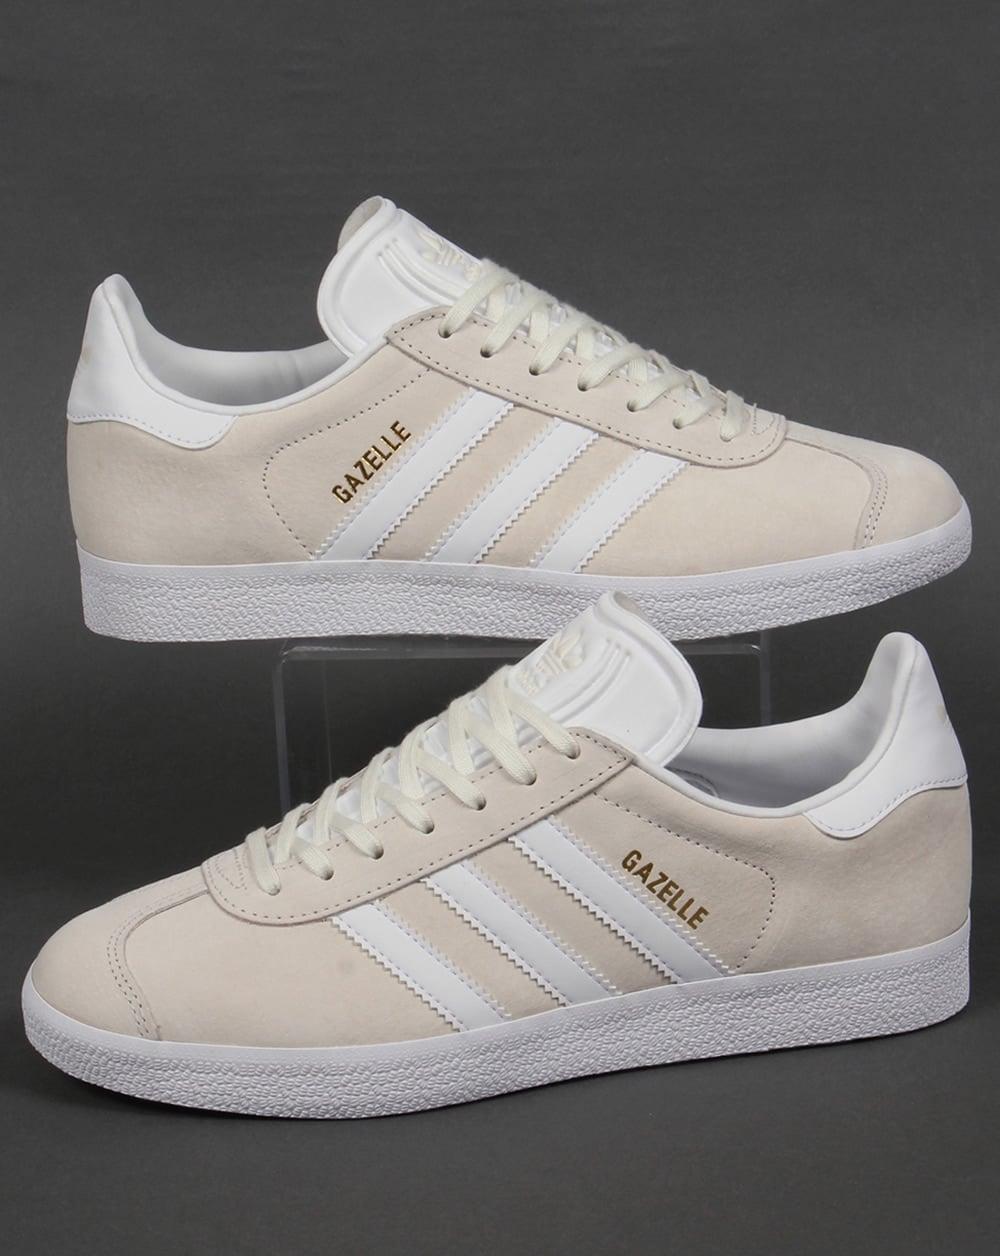 Latest Offers Men Adidas Gazelle Off White